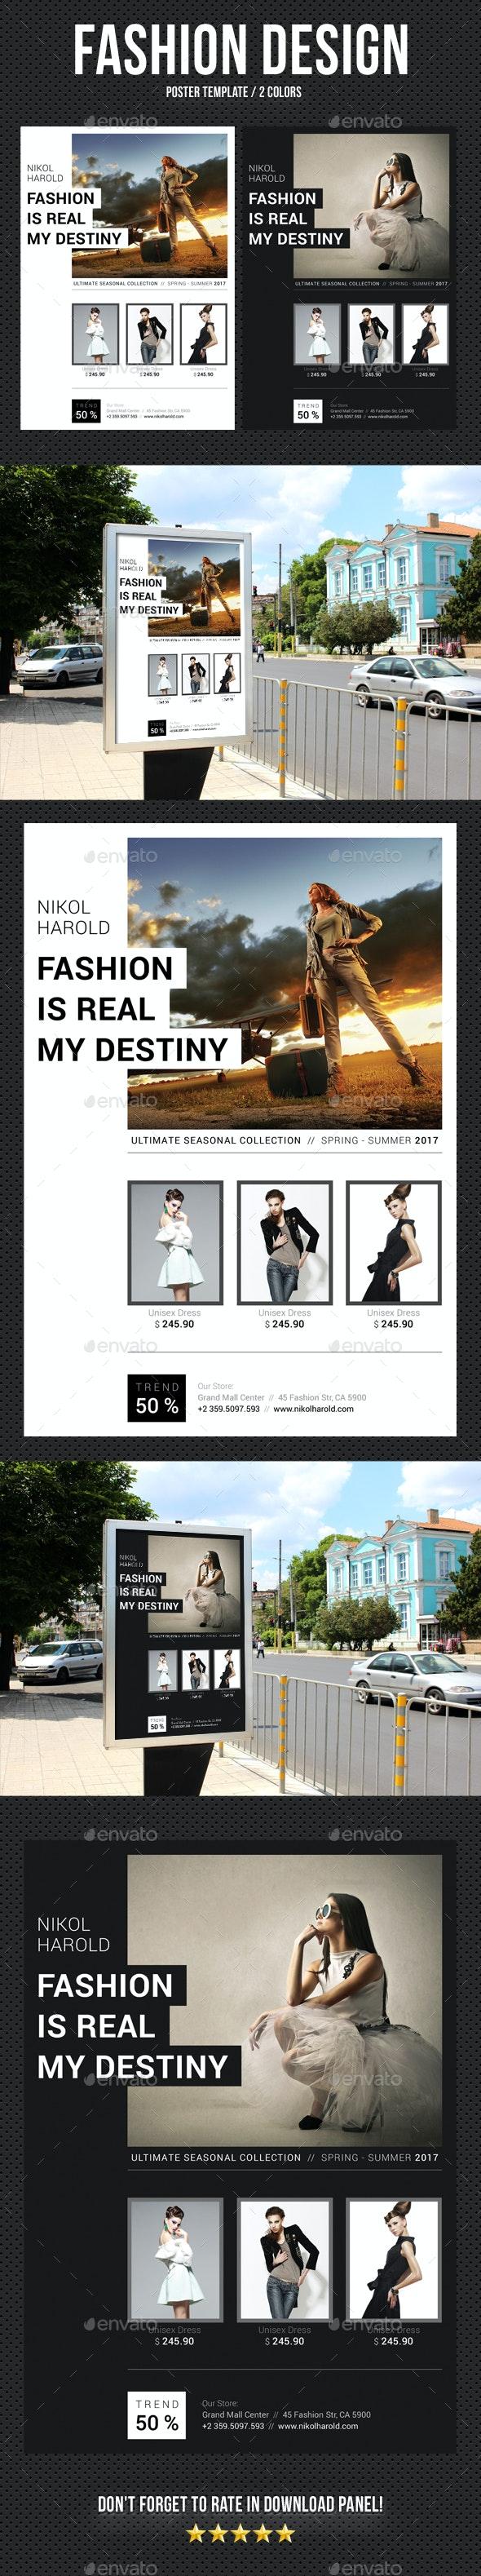 Fashion Poster 02 - Signage Print Templates